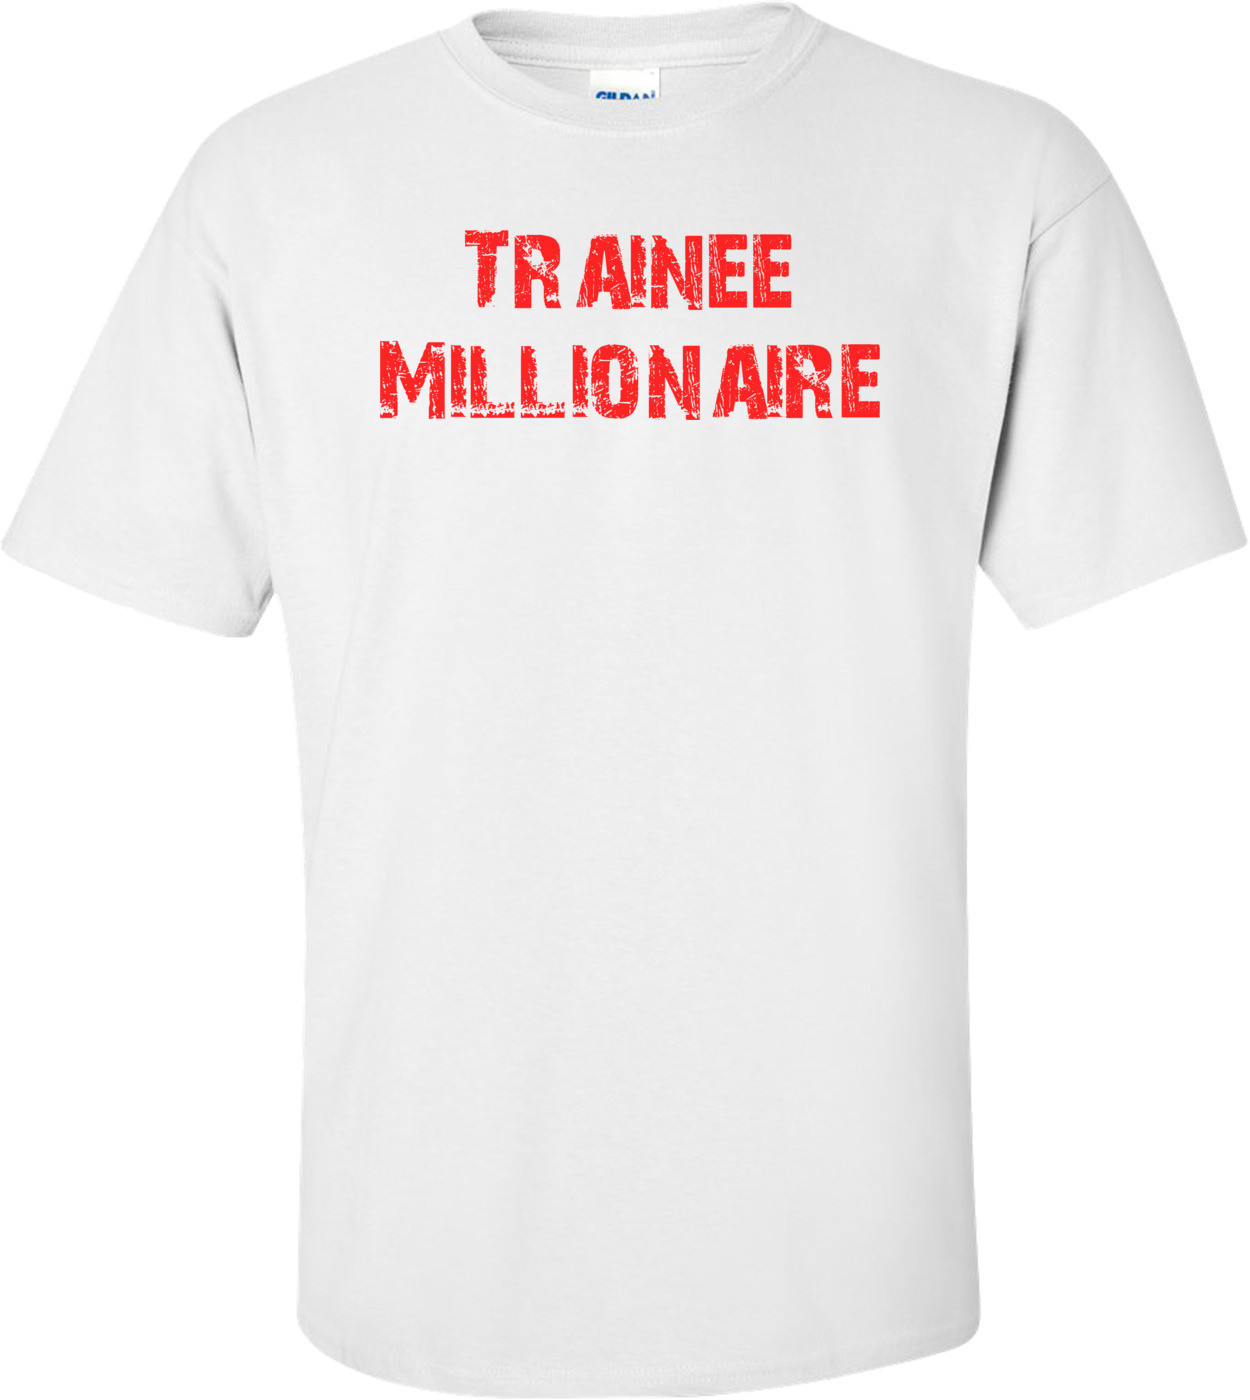 Trainee Millionaire Shirt